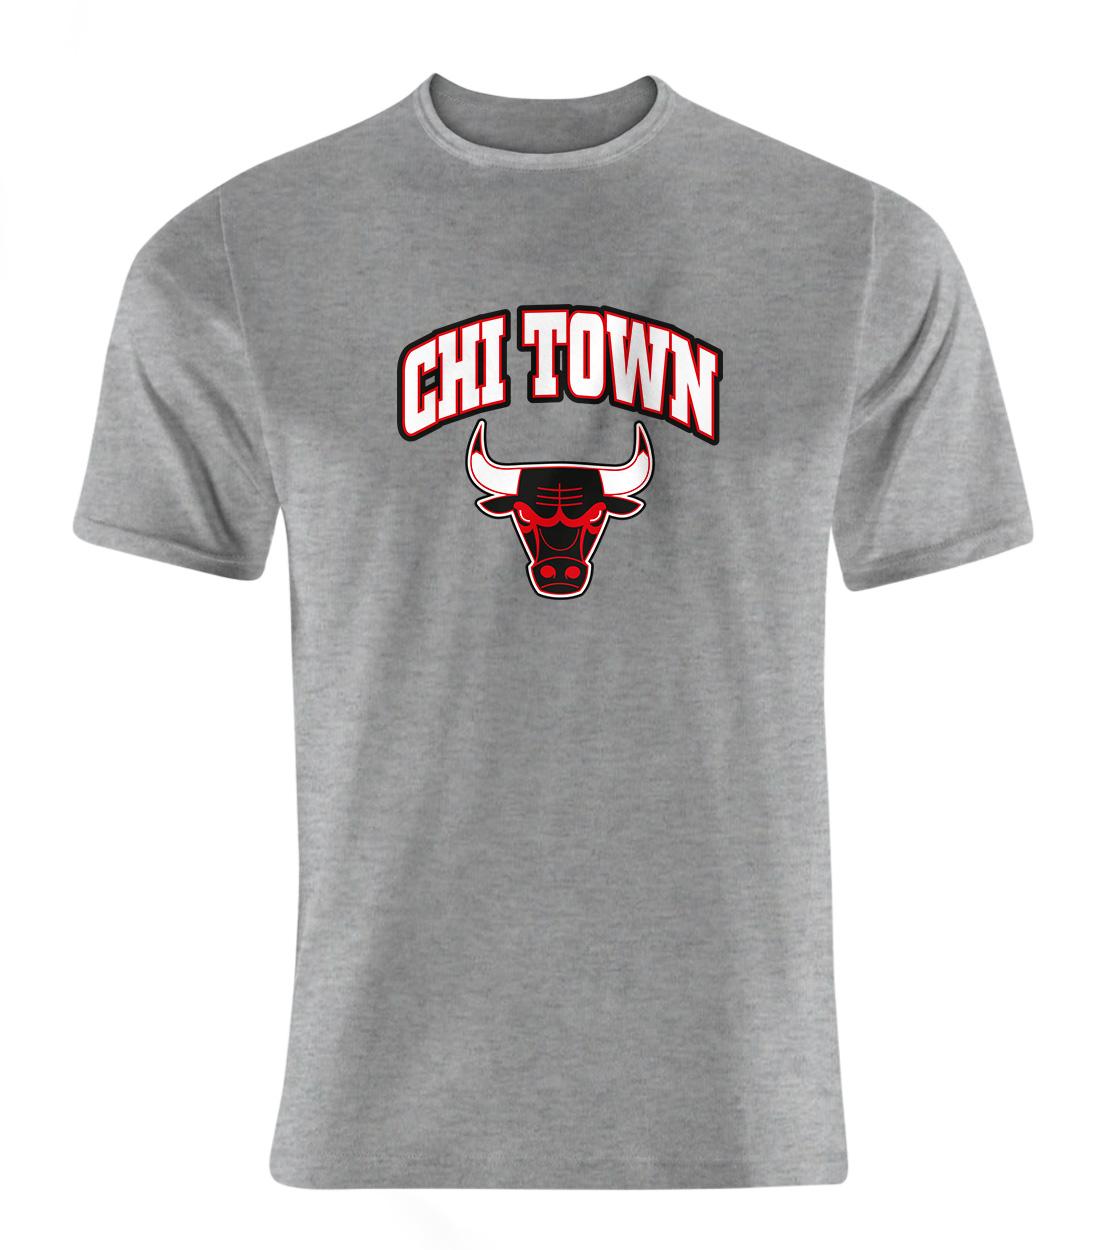 Chicago Bulls Chi Town Tshirt (TSH-GRY-NP-47-NBA-CHI-TOWN)